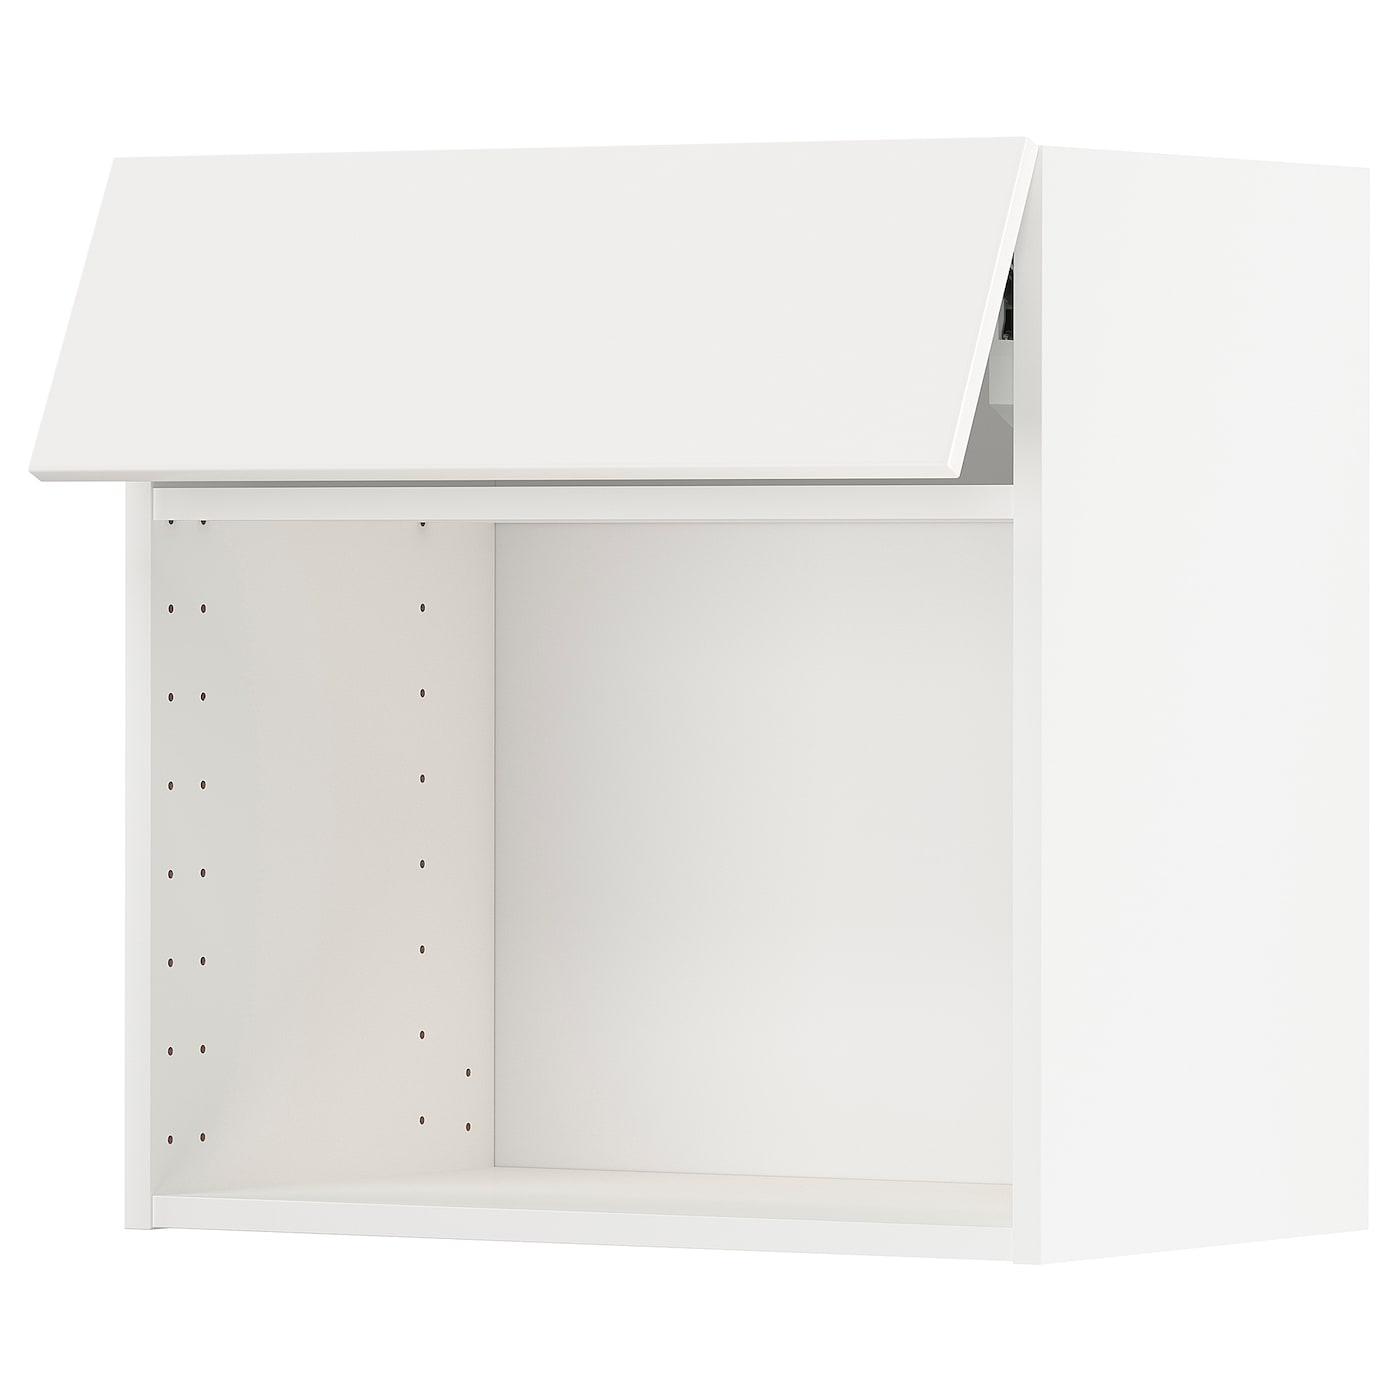 Metod Wandschrank Fur Mikrowellenherd Weiss Veddinge Weiss Ikea